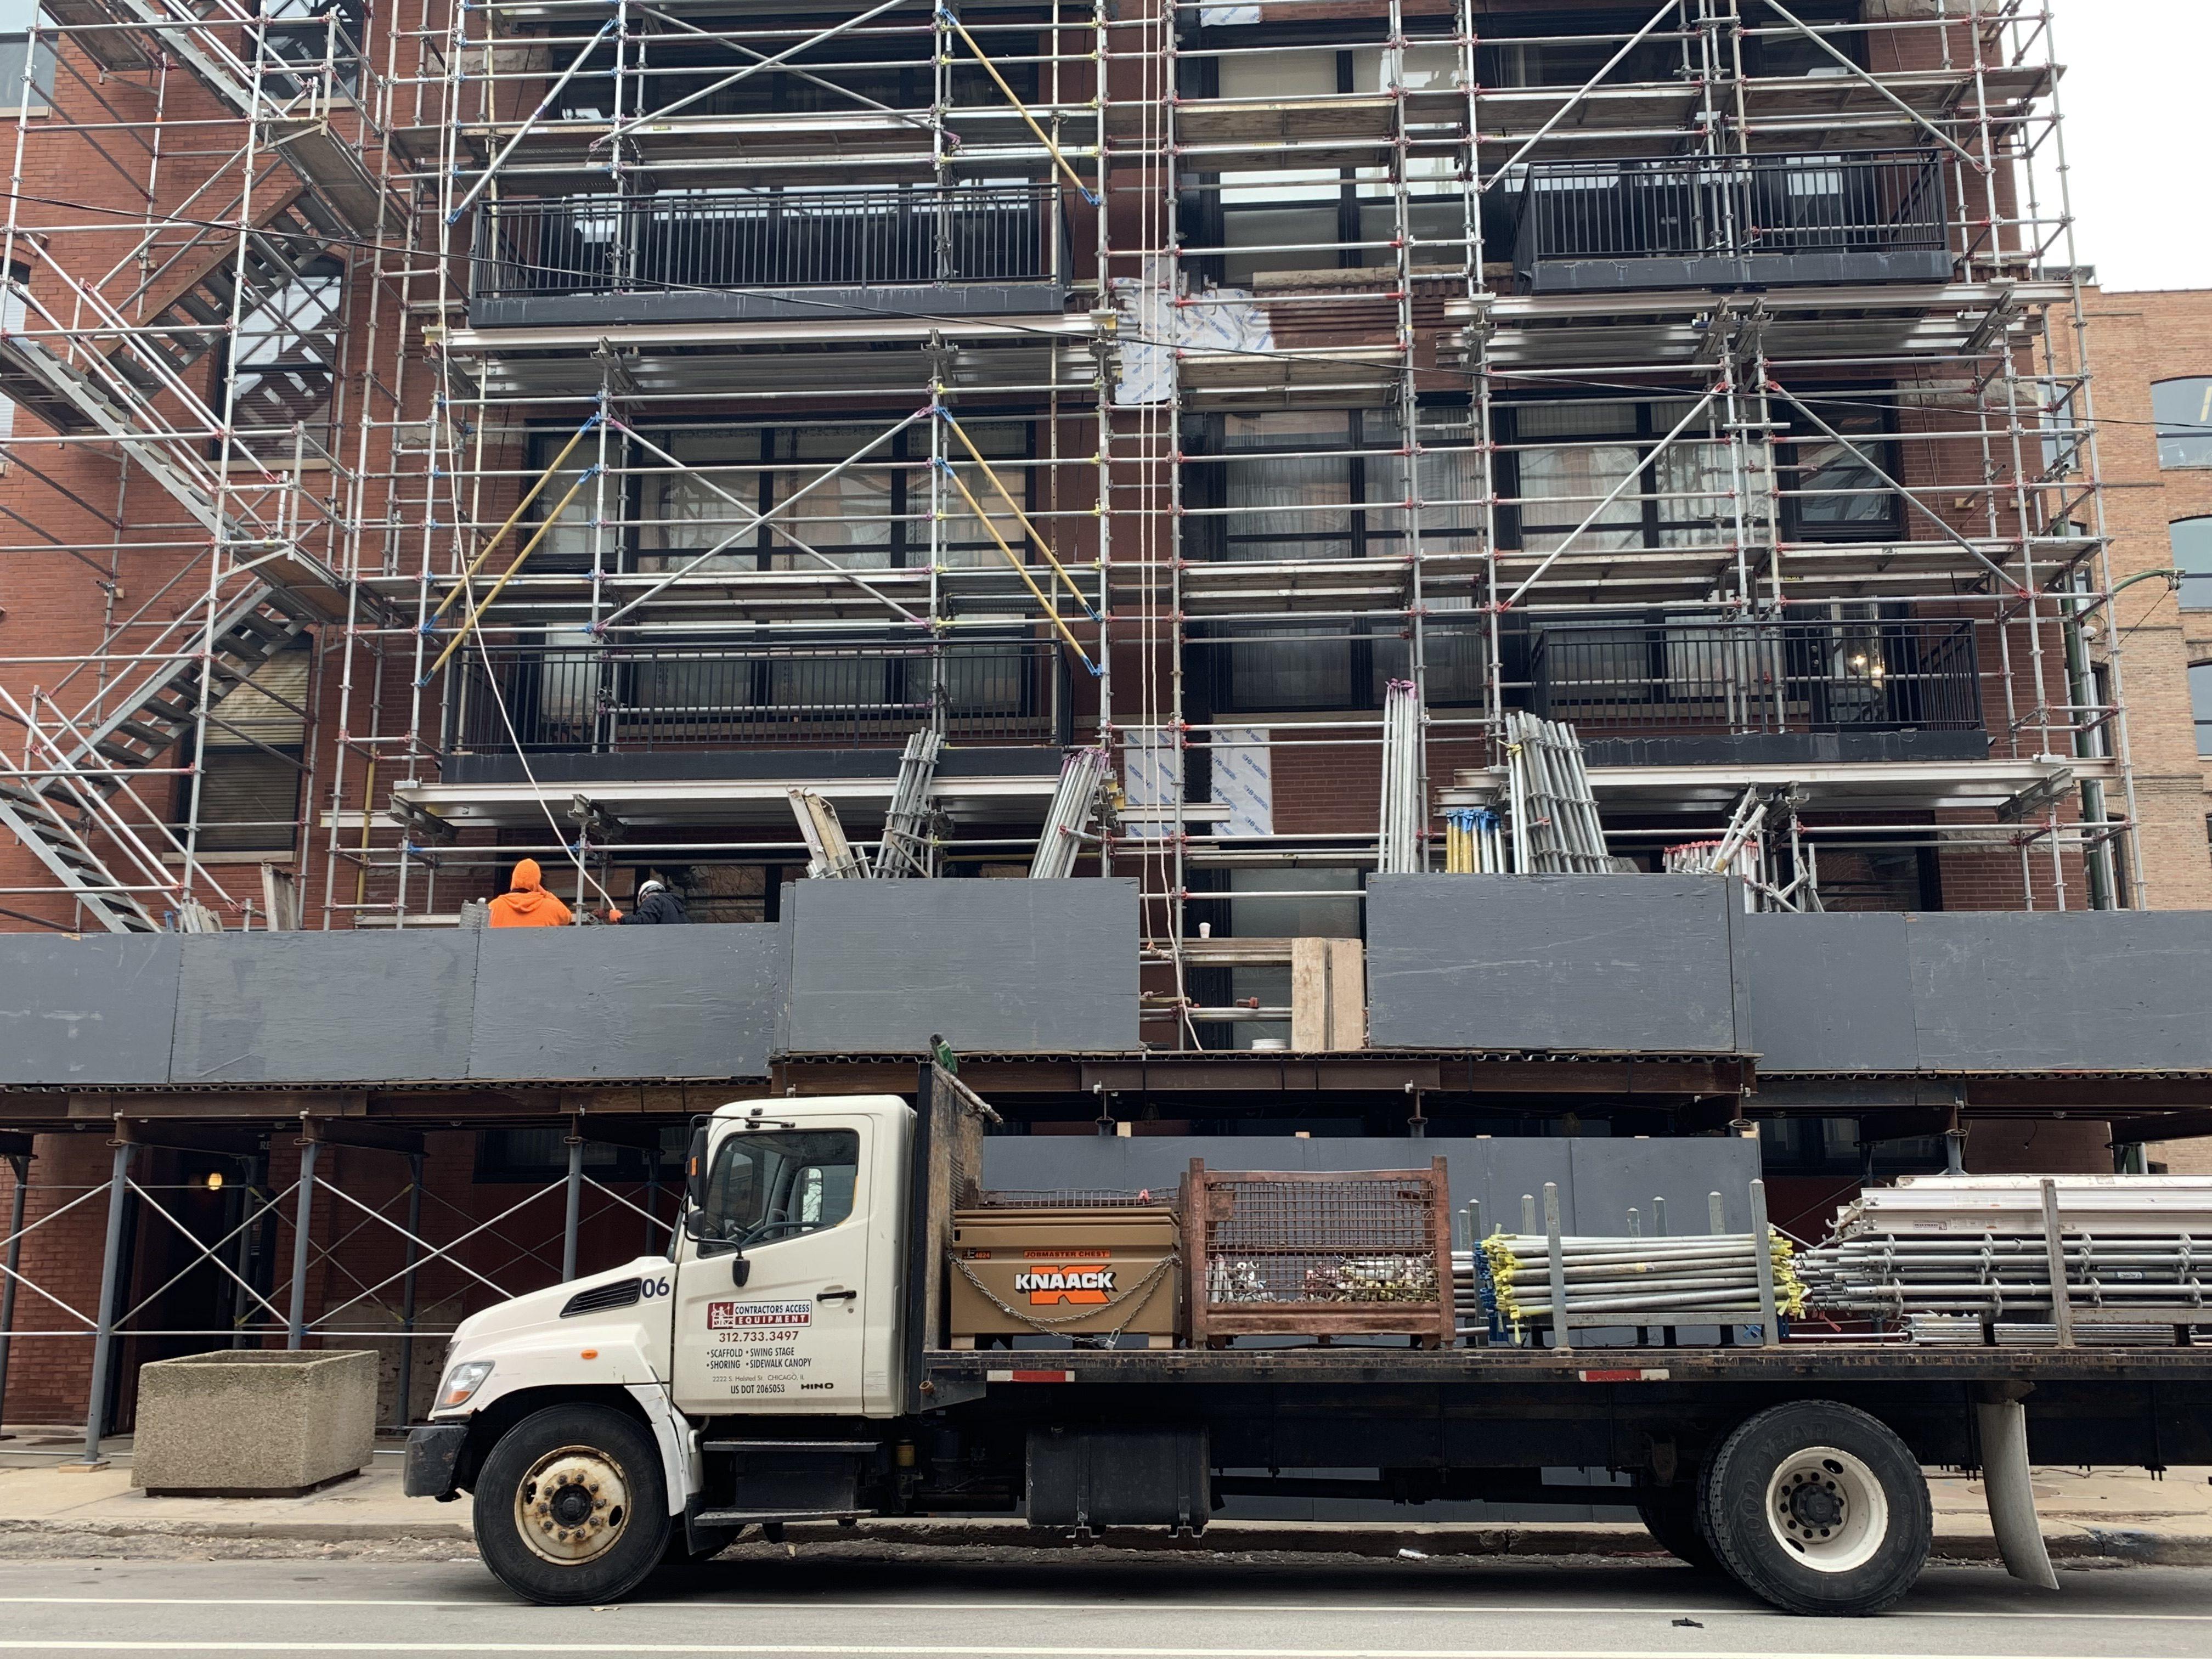 541 W. Fulton - Shoring & Tower scaffold 5